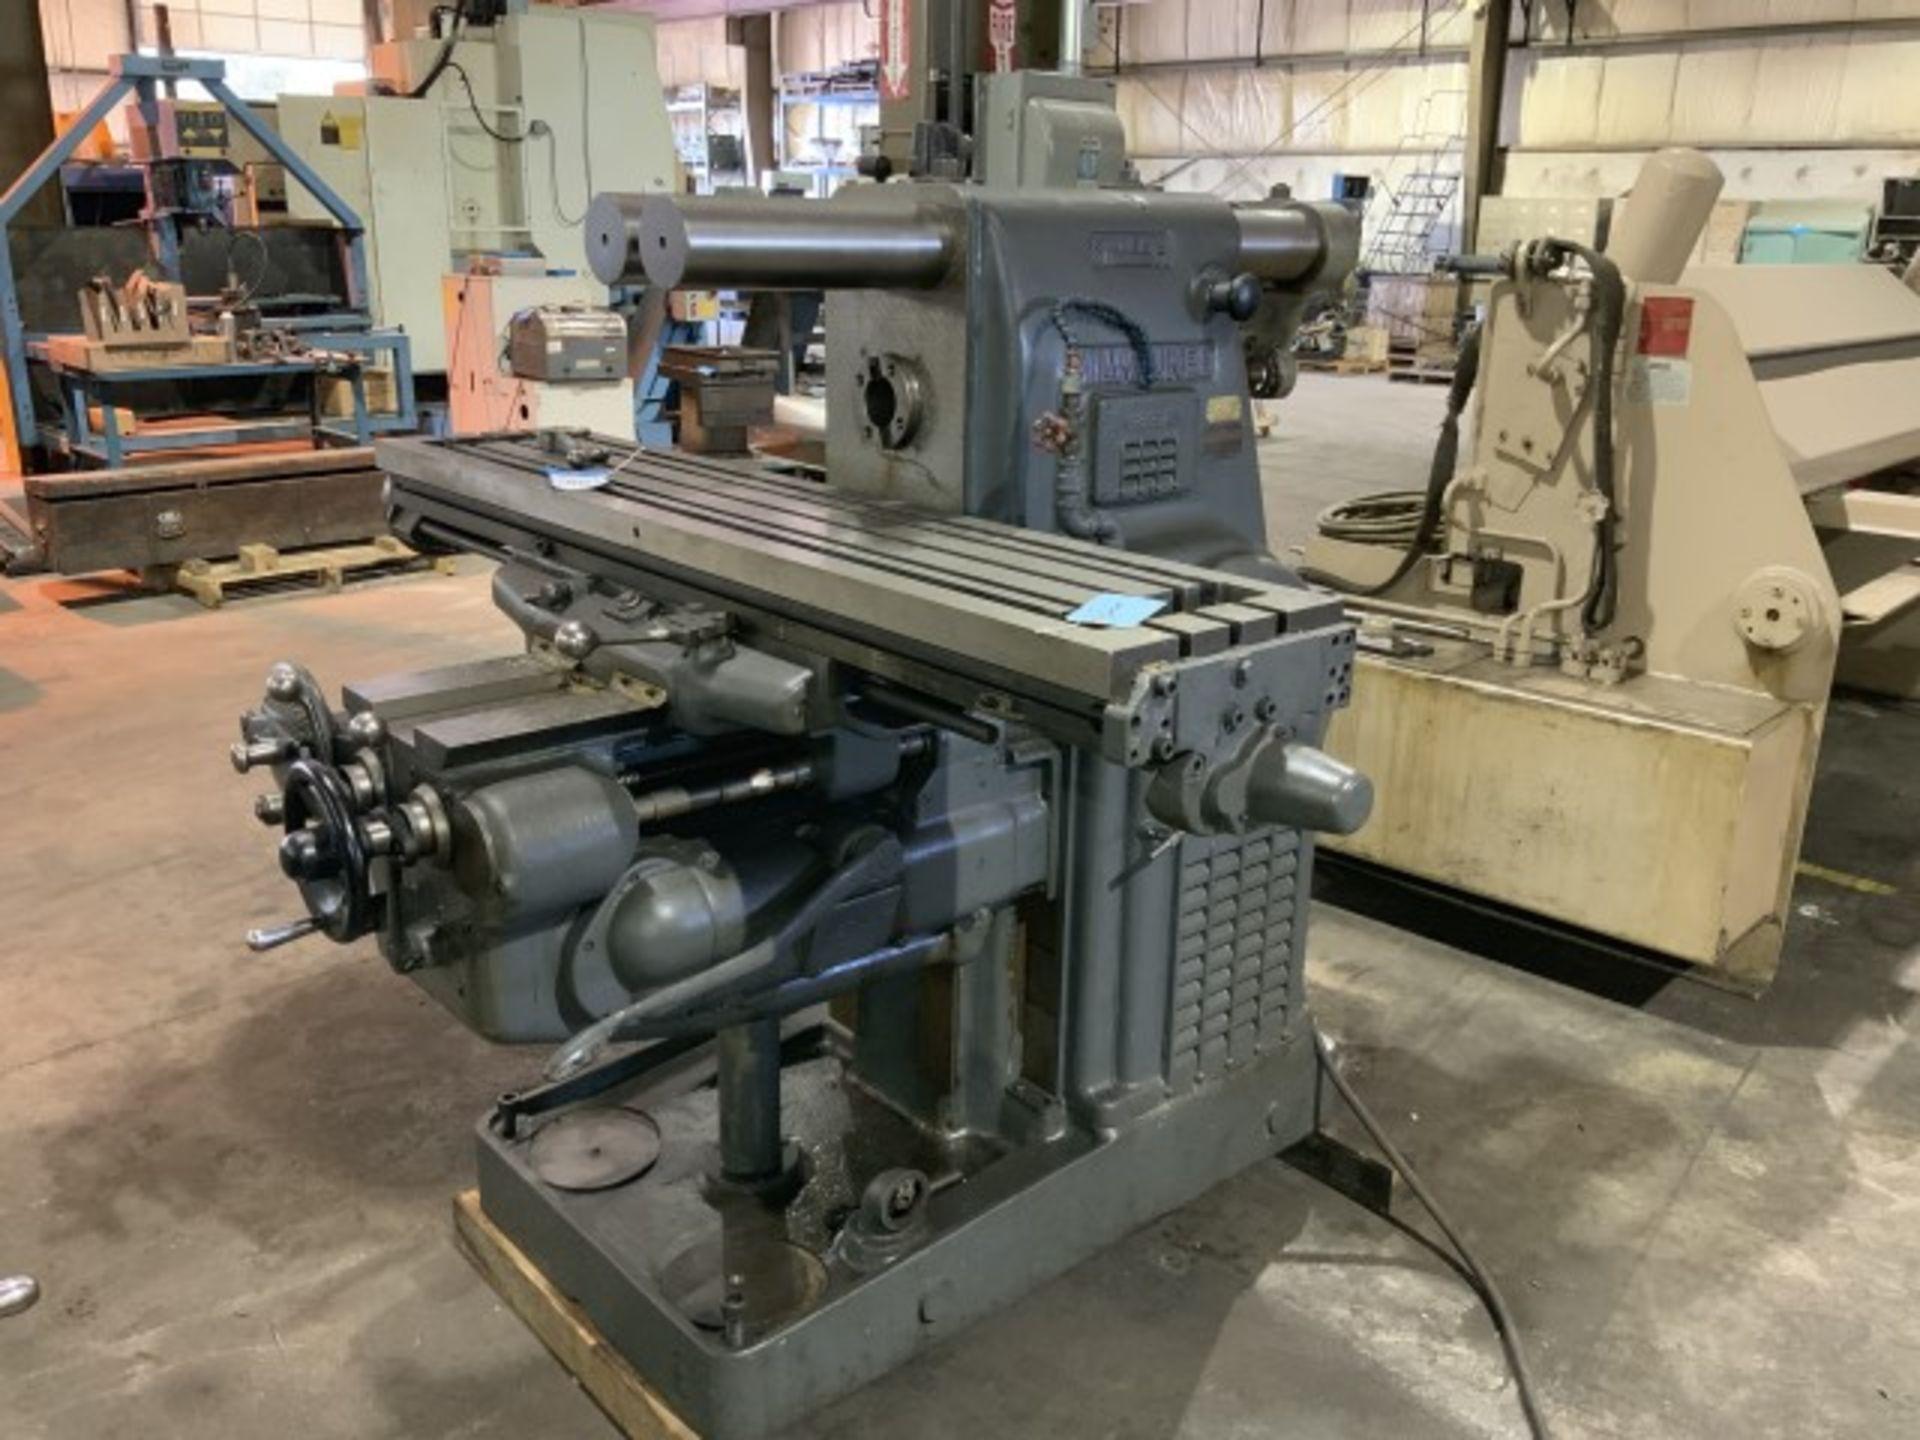 Horizontal milling machine - Image 2 of 6